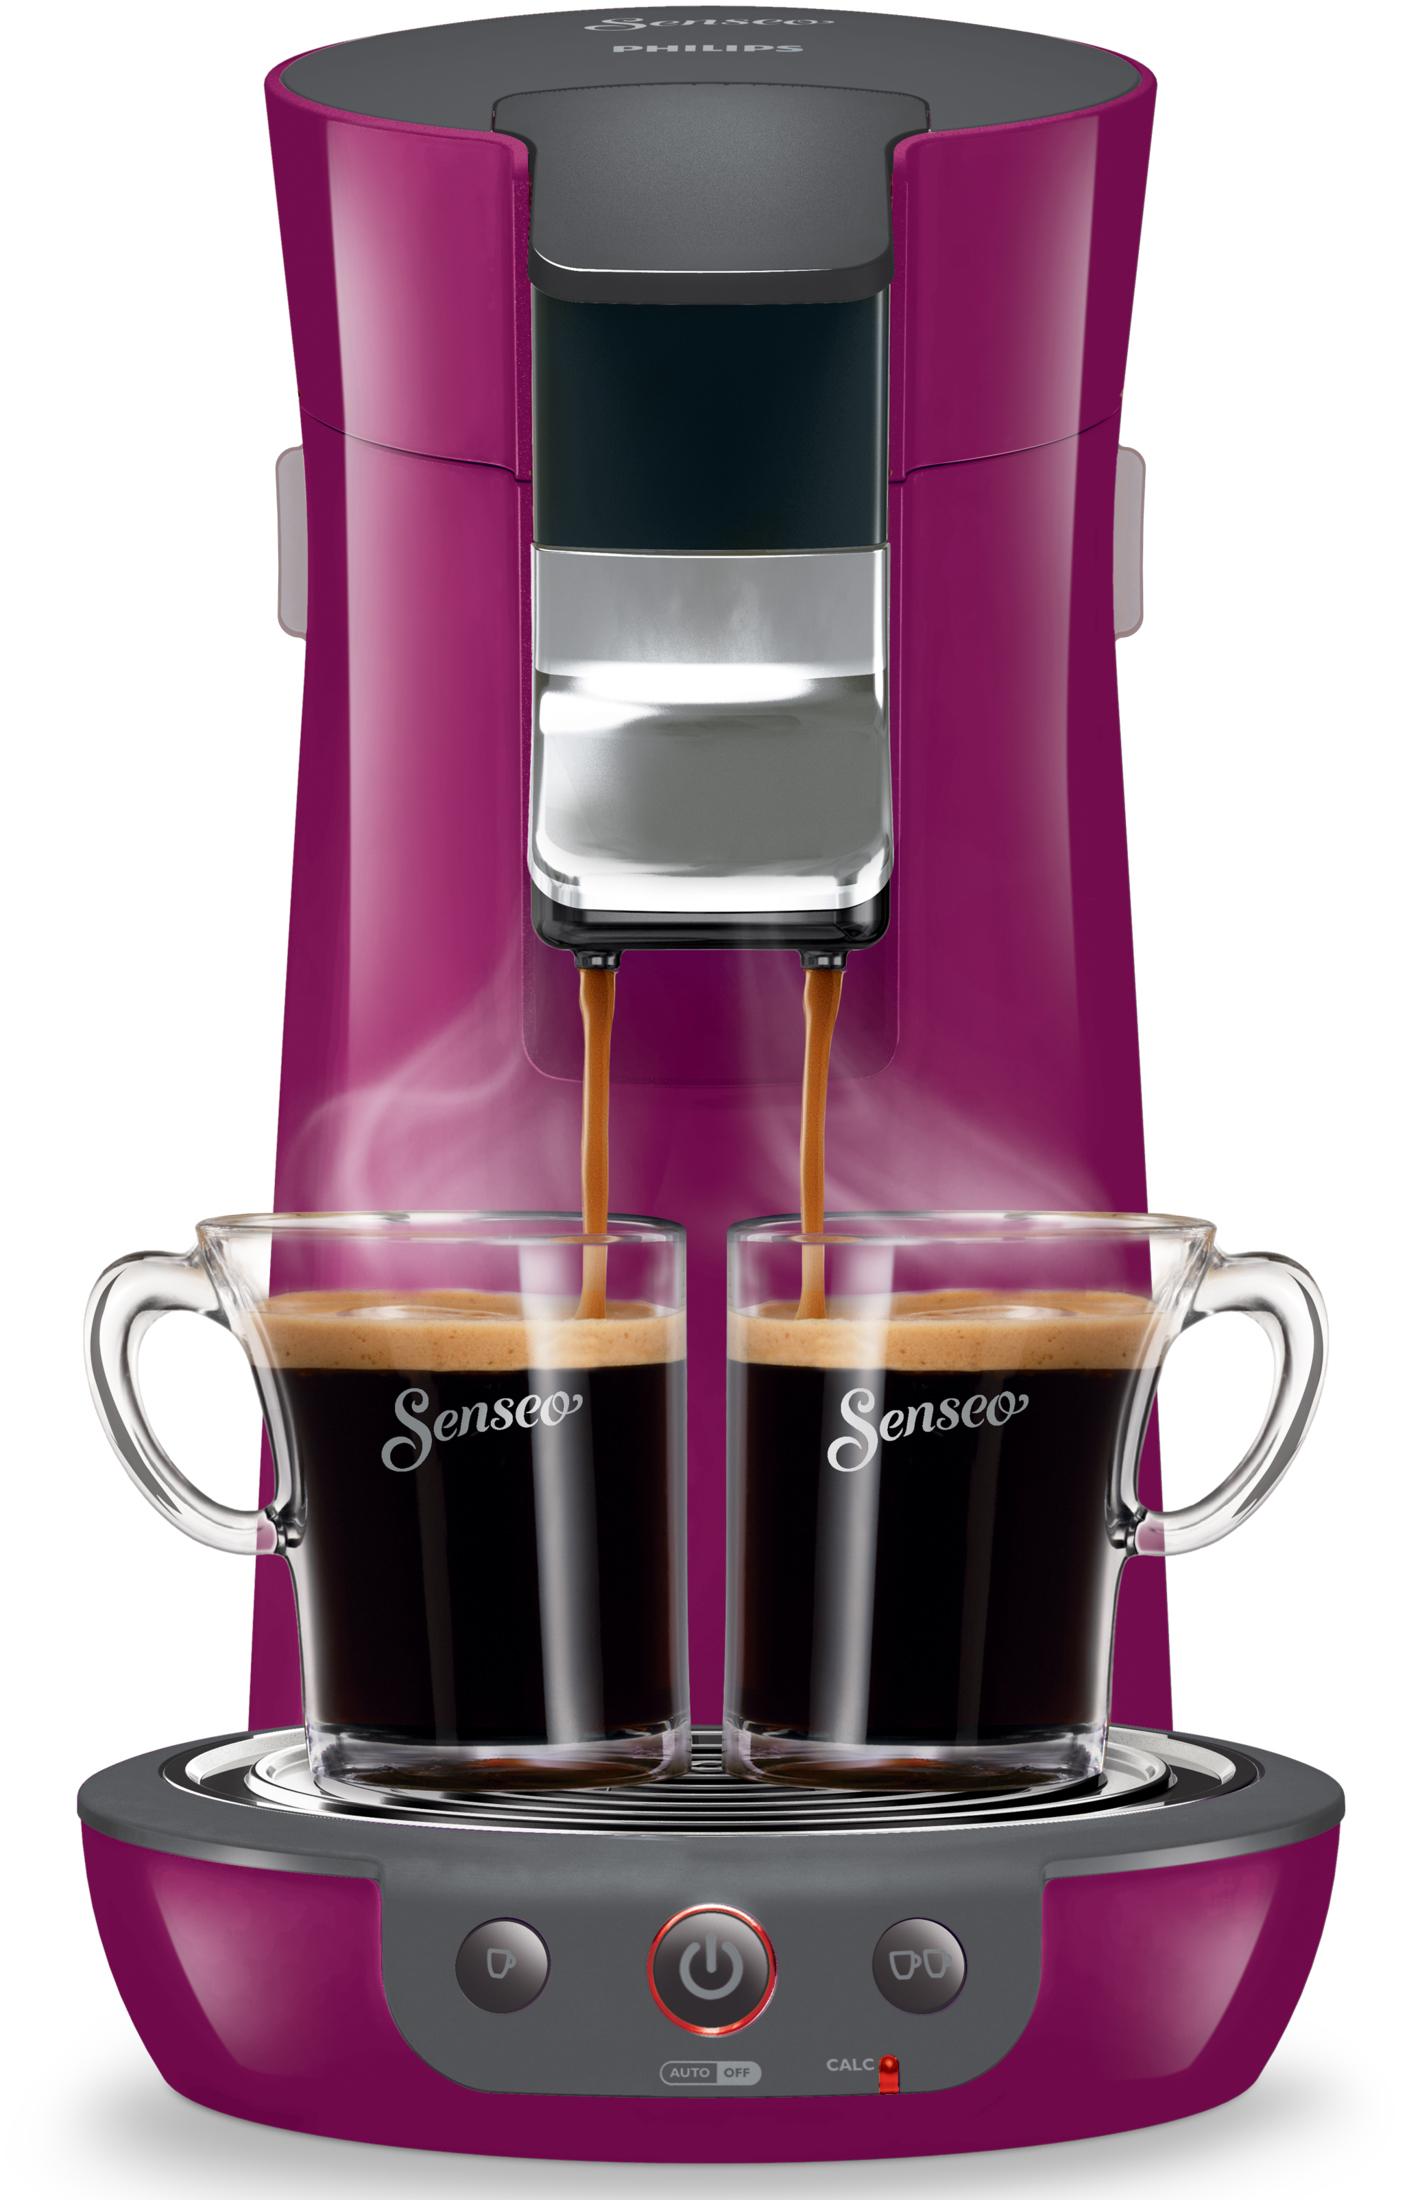 philips kaffeemaschine senseo viva caf pad system bunte farben. Black Bedroom Furniture Sets. Home Design Ideas